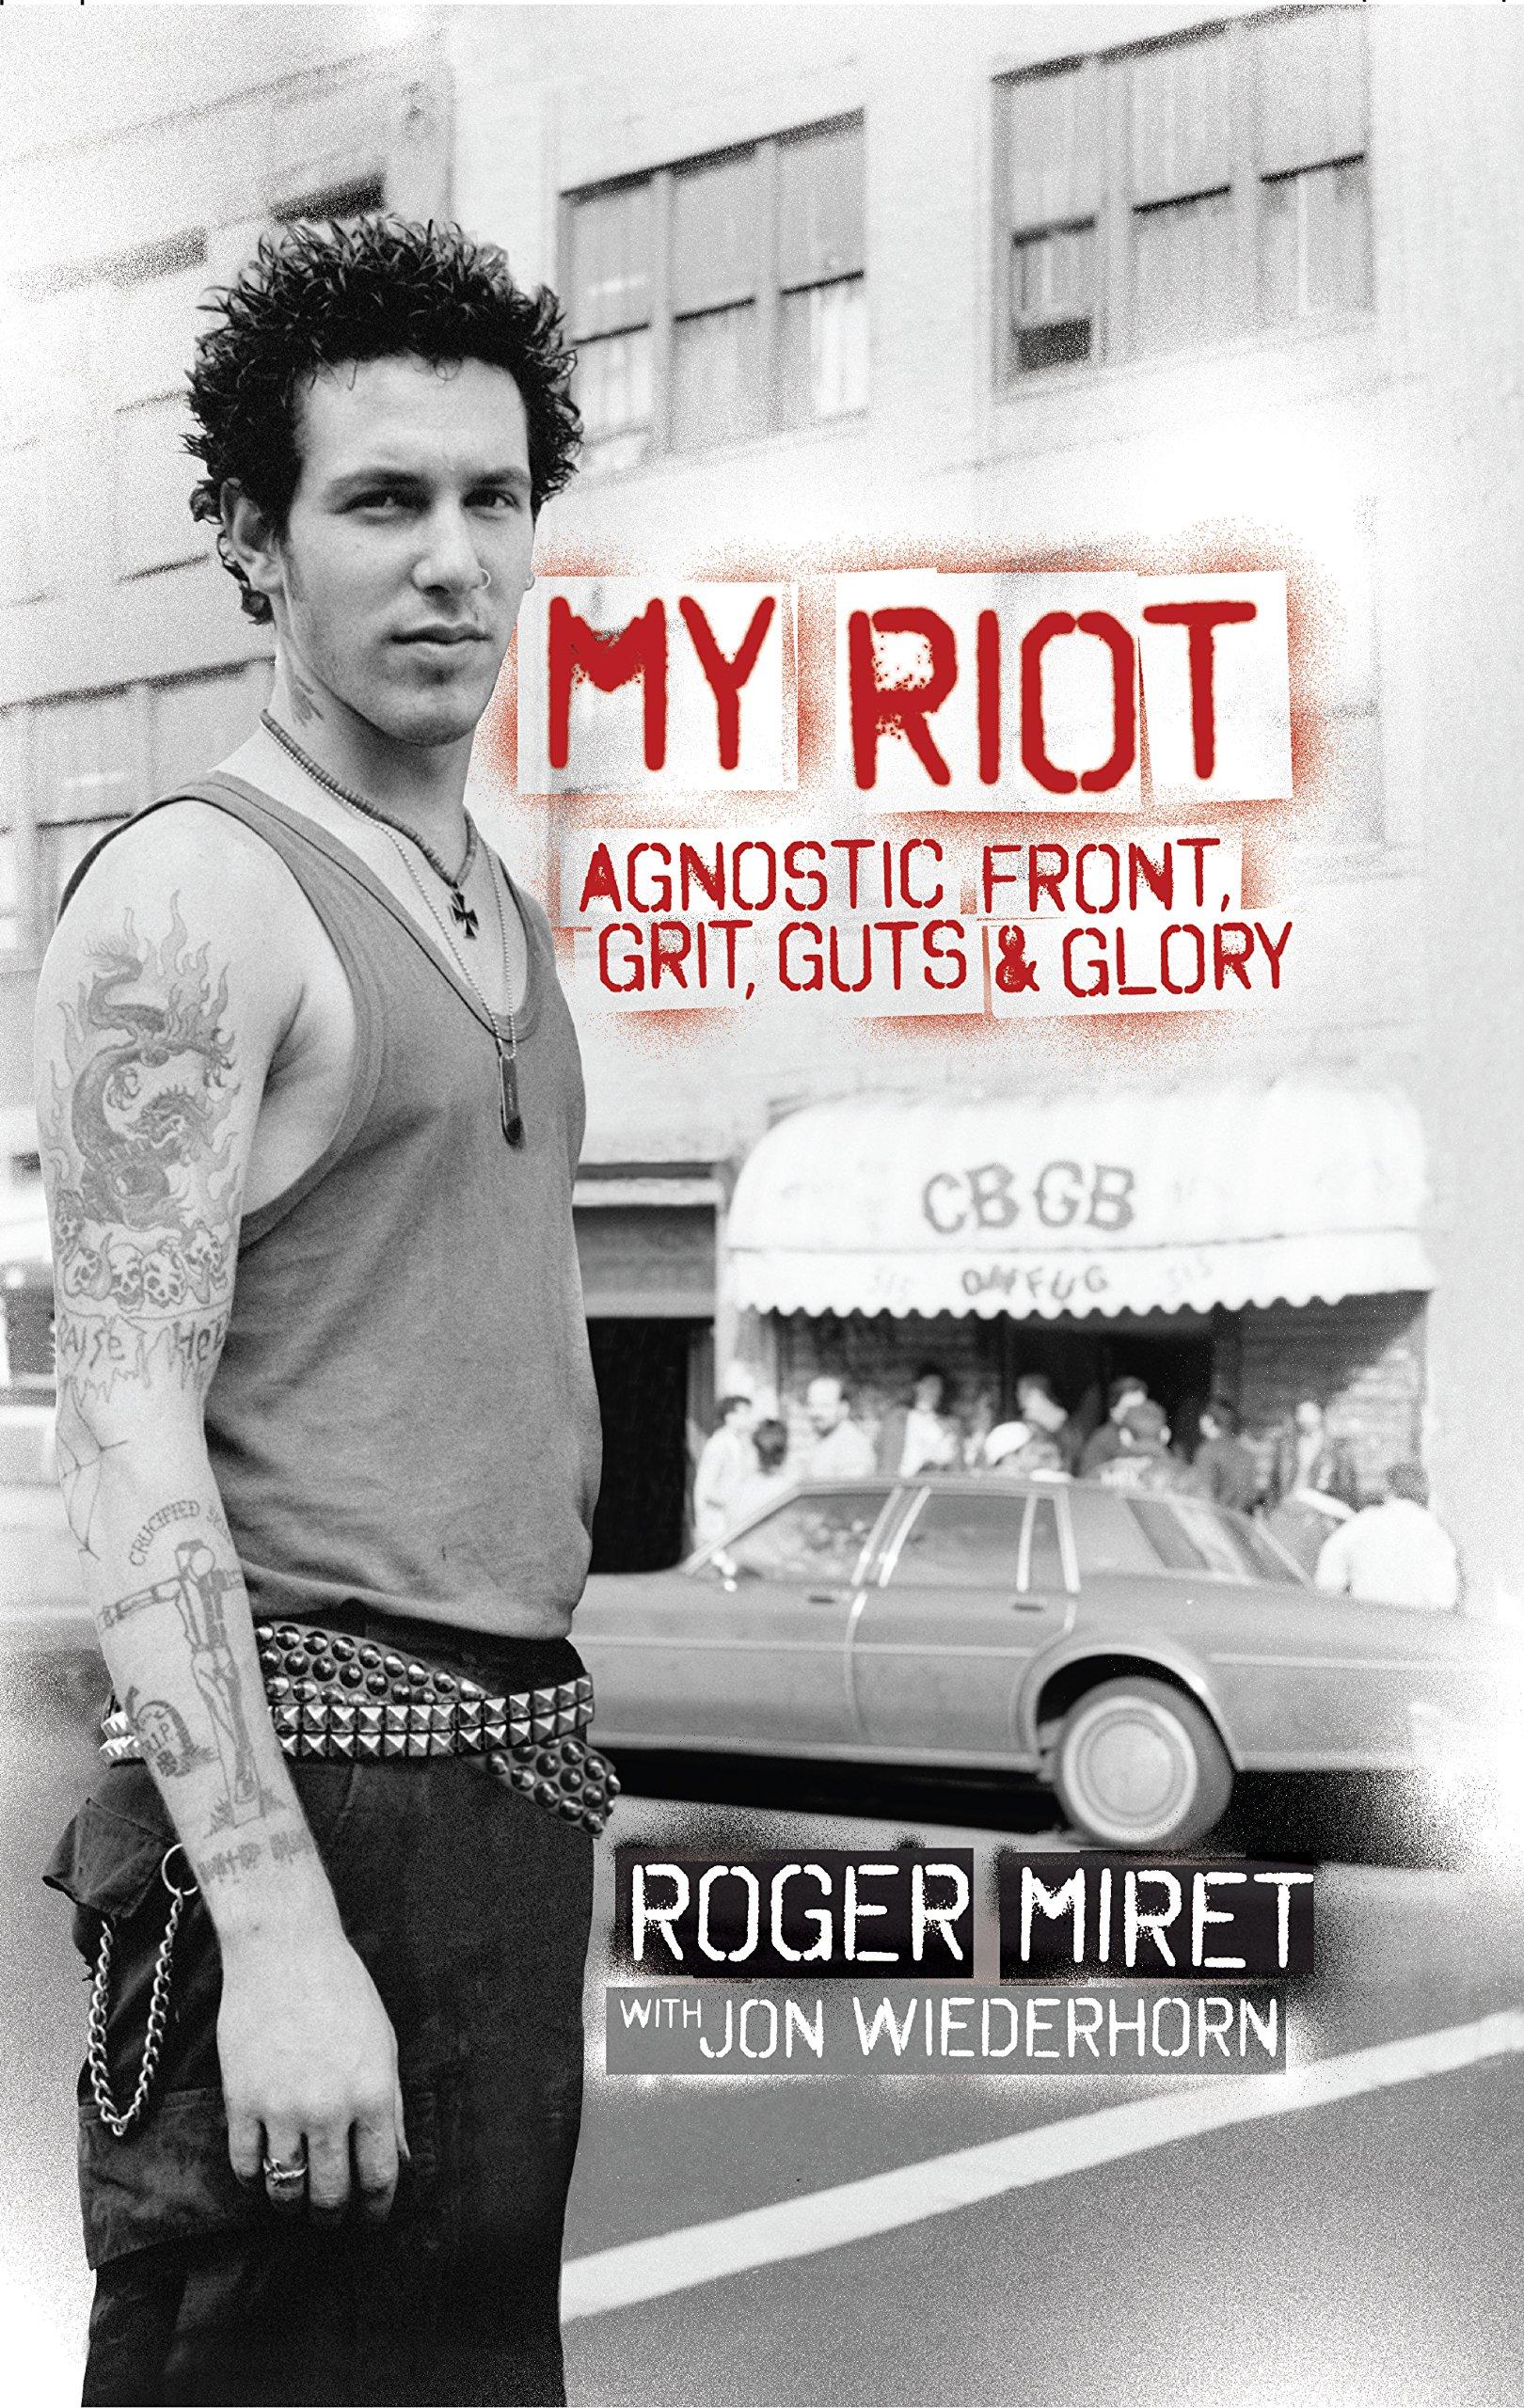 My Riot: Agnostic Front, Grit, Guts & Glory: Amazon.es: Roger Miret, Jon Wiederhorn: Libros en idiomas extranjeros